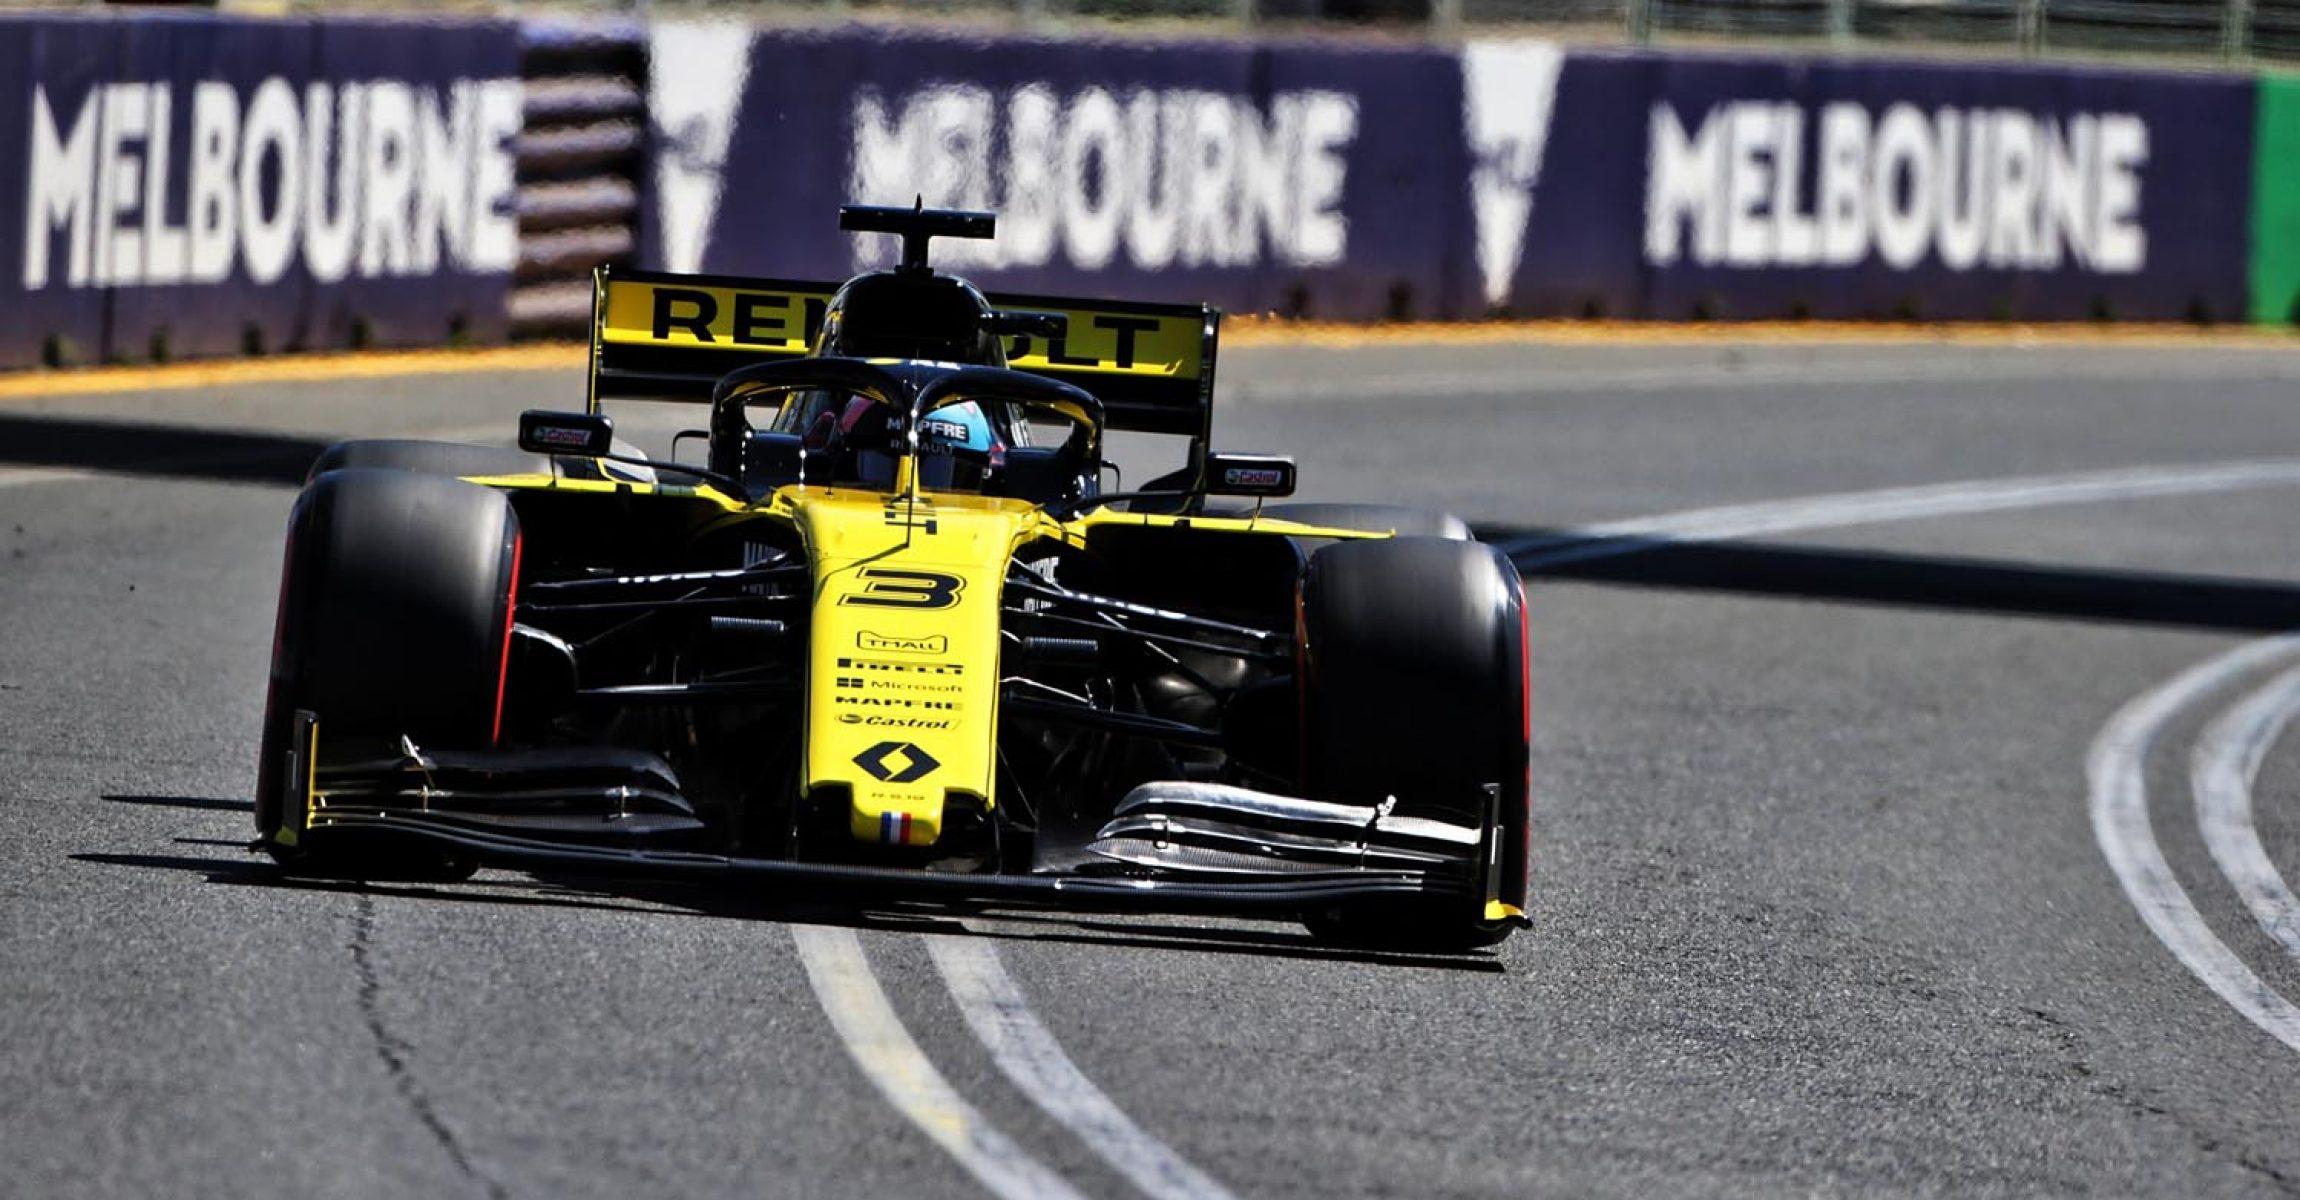 Daniel Ricciardo (AUS) Renault F1 Team RS19. Australian Grand Prix, Friday 15th March 2019. Albert Park, Melbourne, Australia.